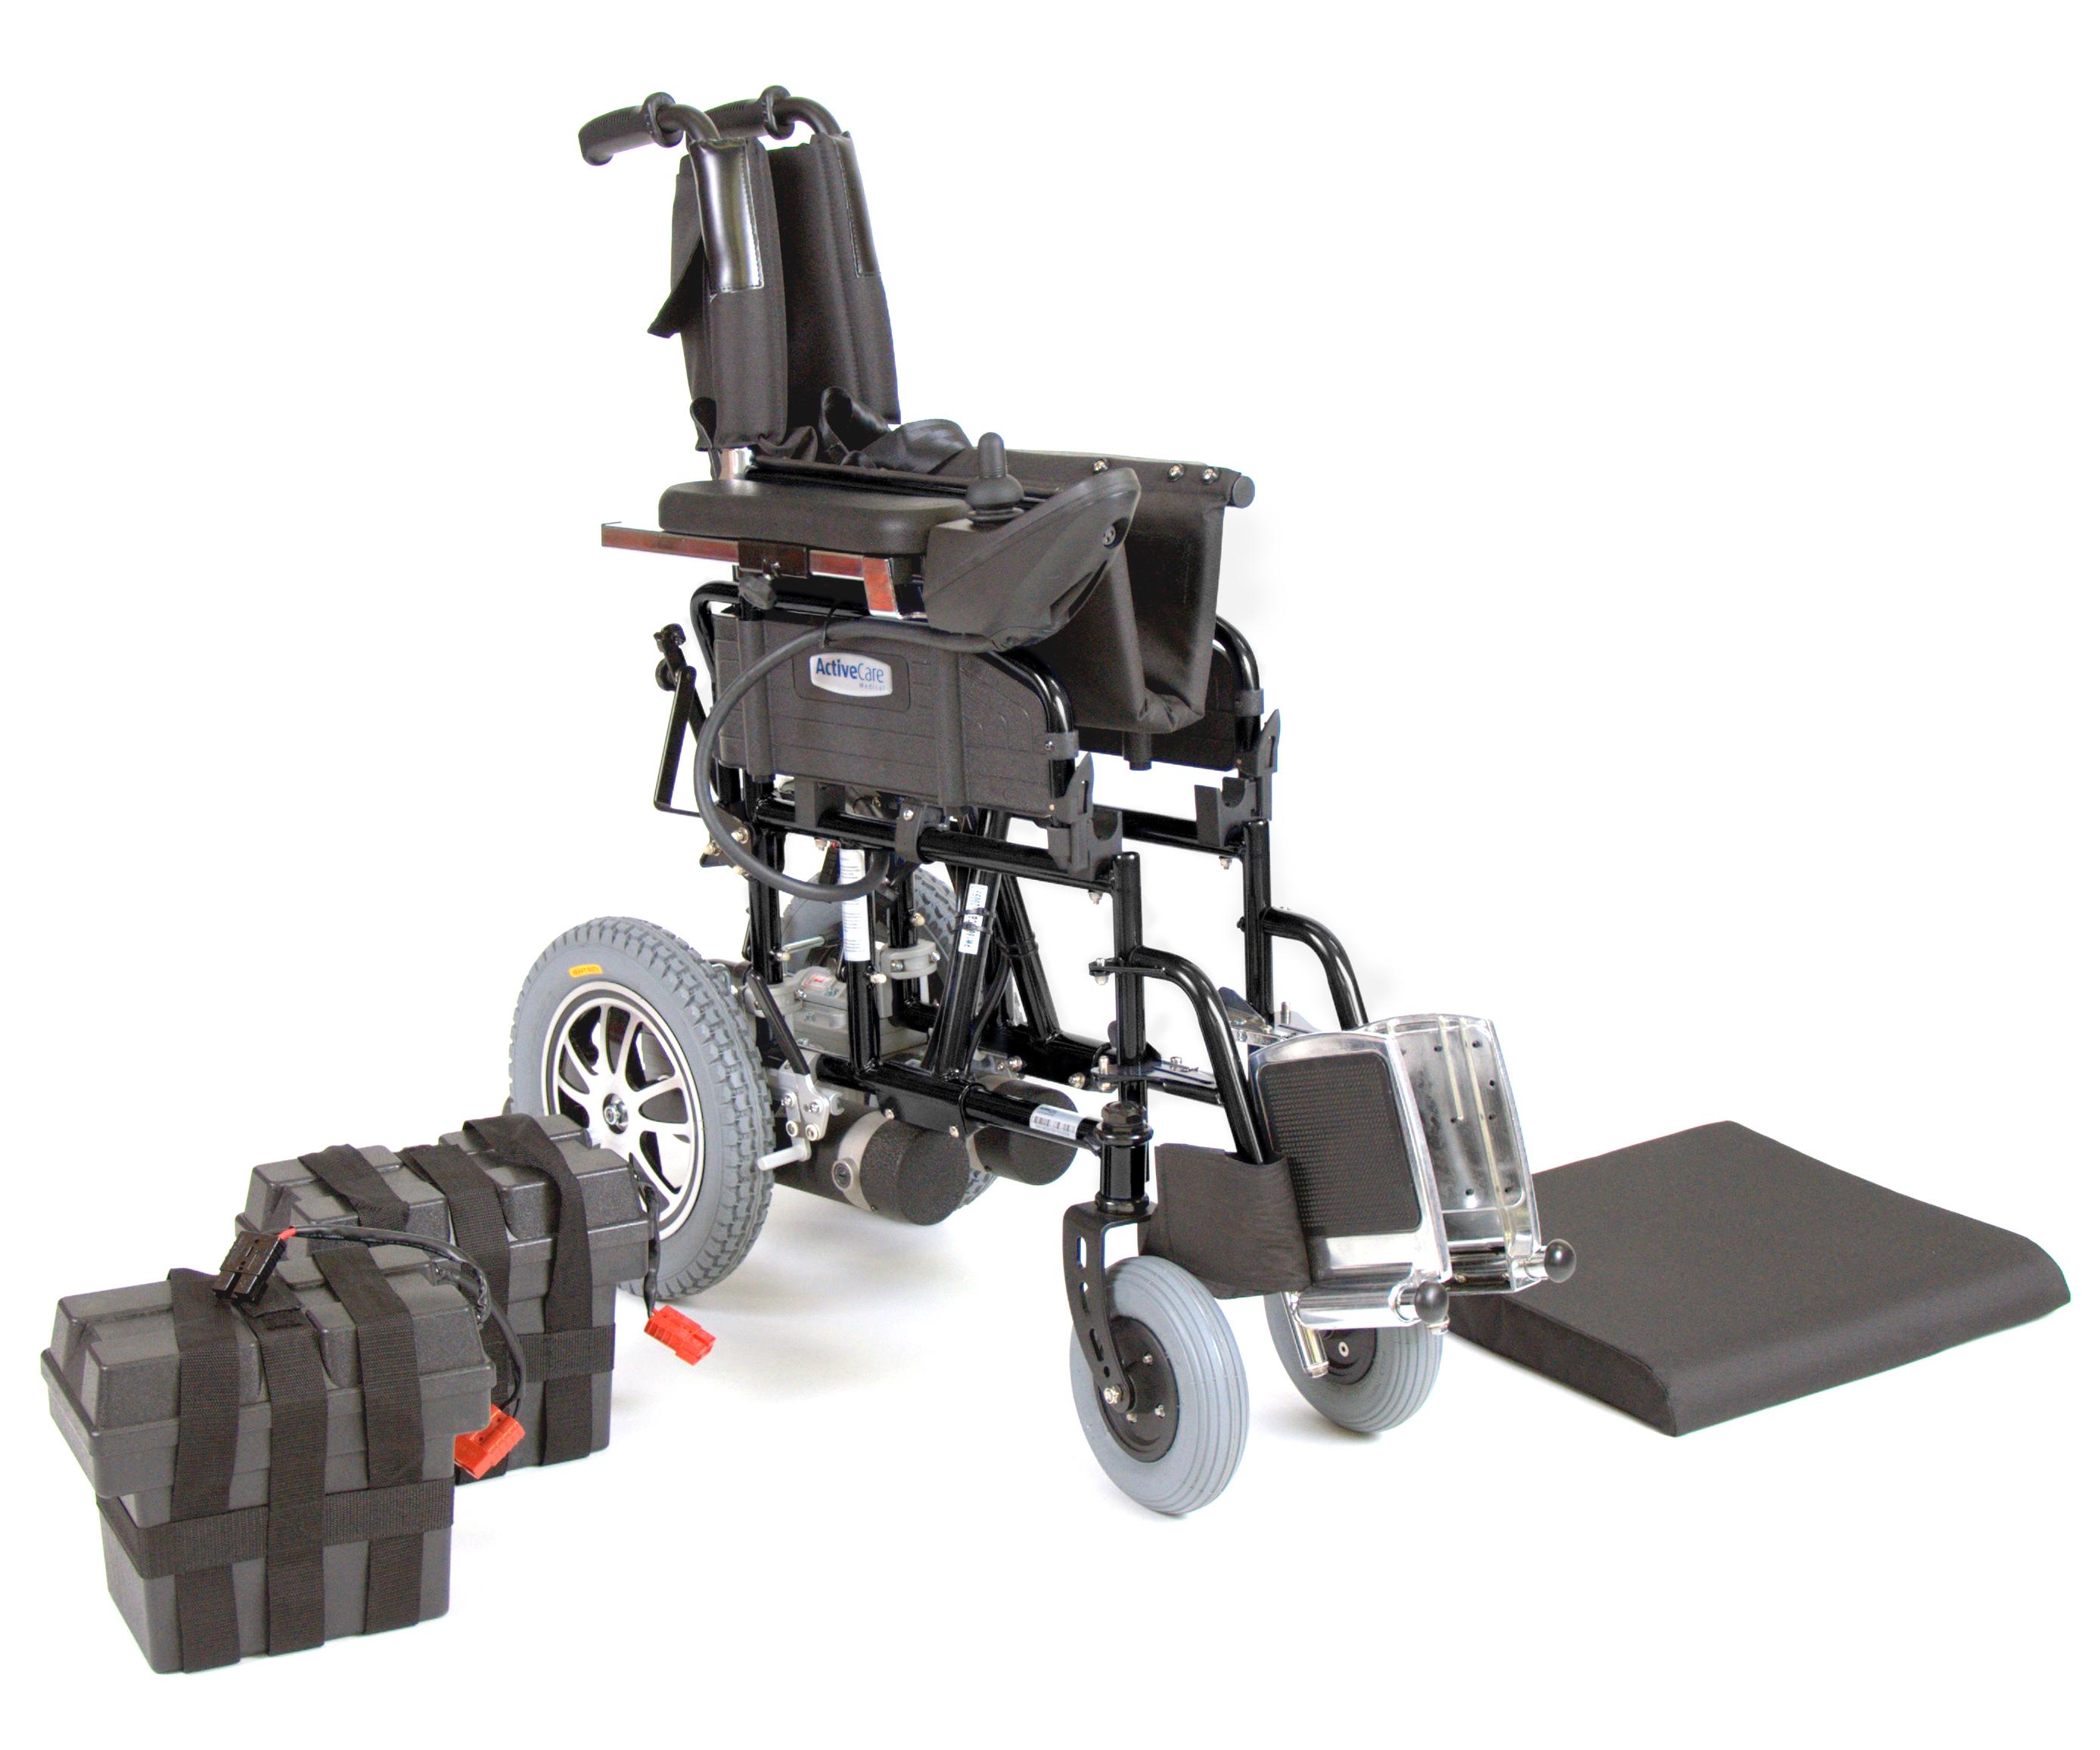 wildcat-folding-power-wheelchair-wildcat20y-drive-medical-2.jpg